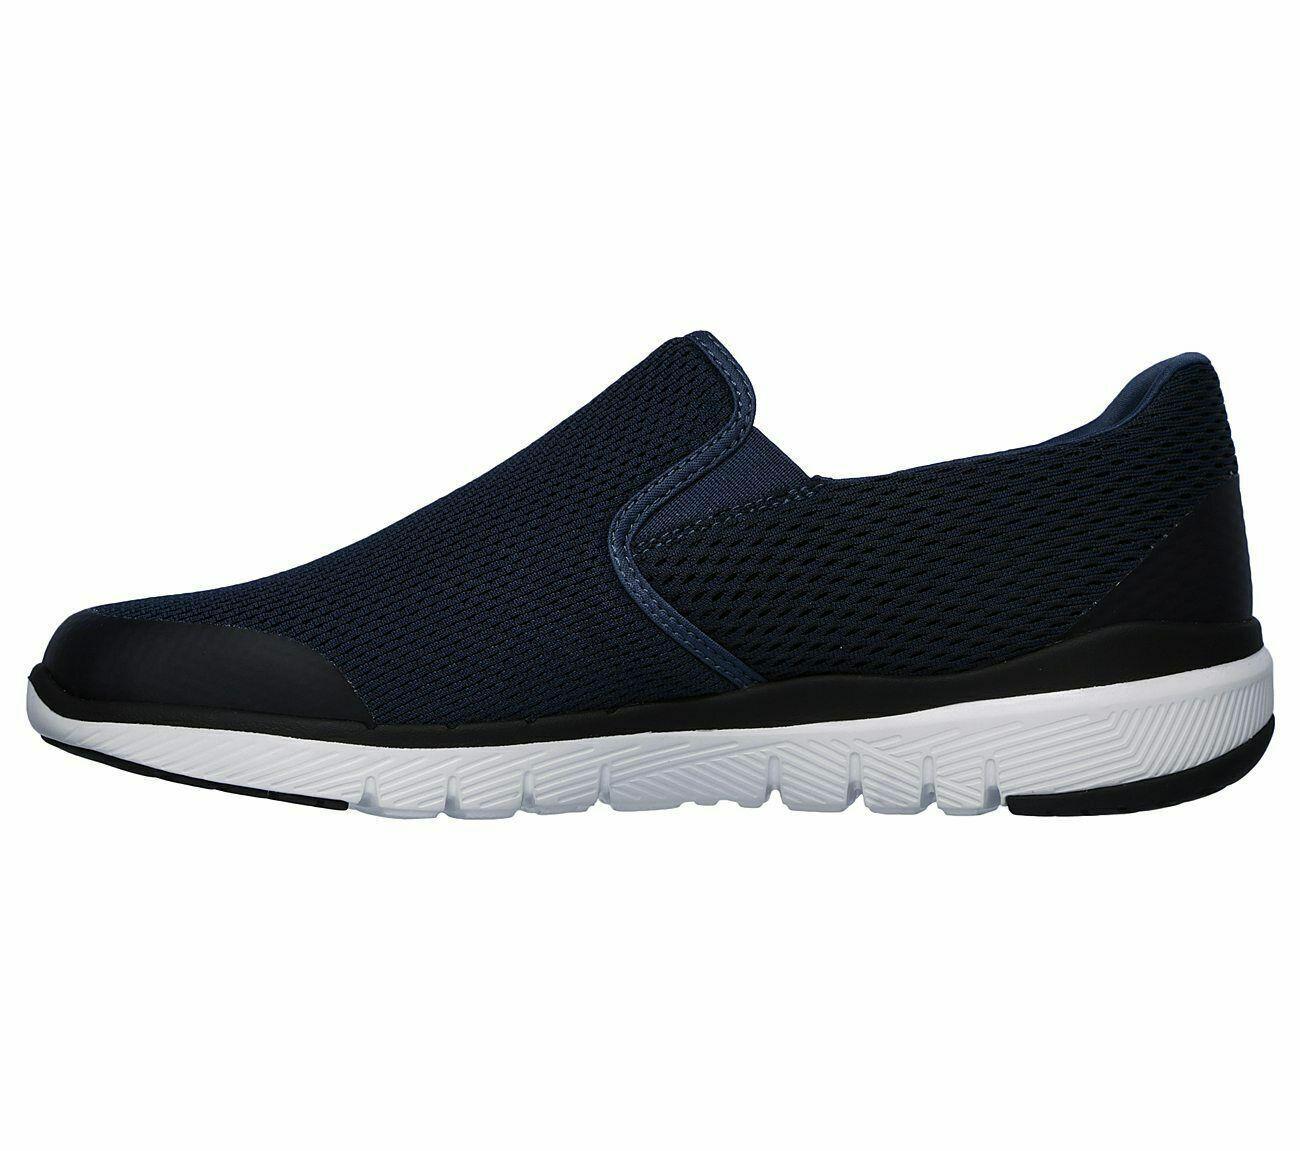 Black Slip On Shoes Skechers Men/'s Foam Casual Sport Soft Woven 52961 Air Cooled